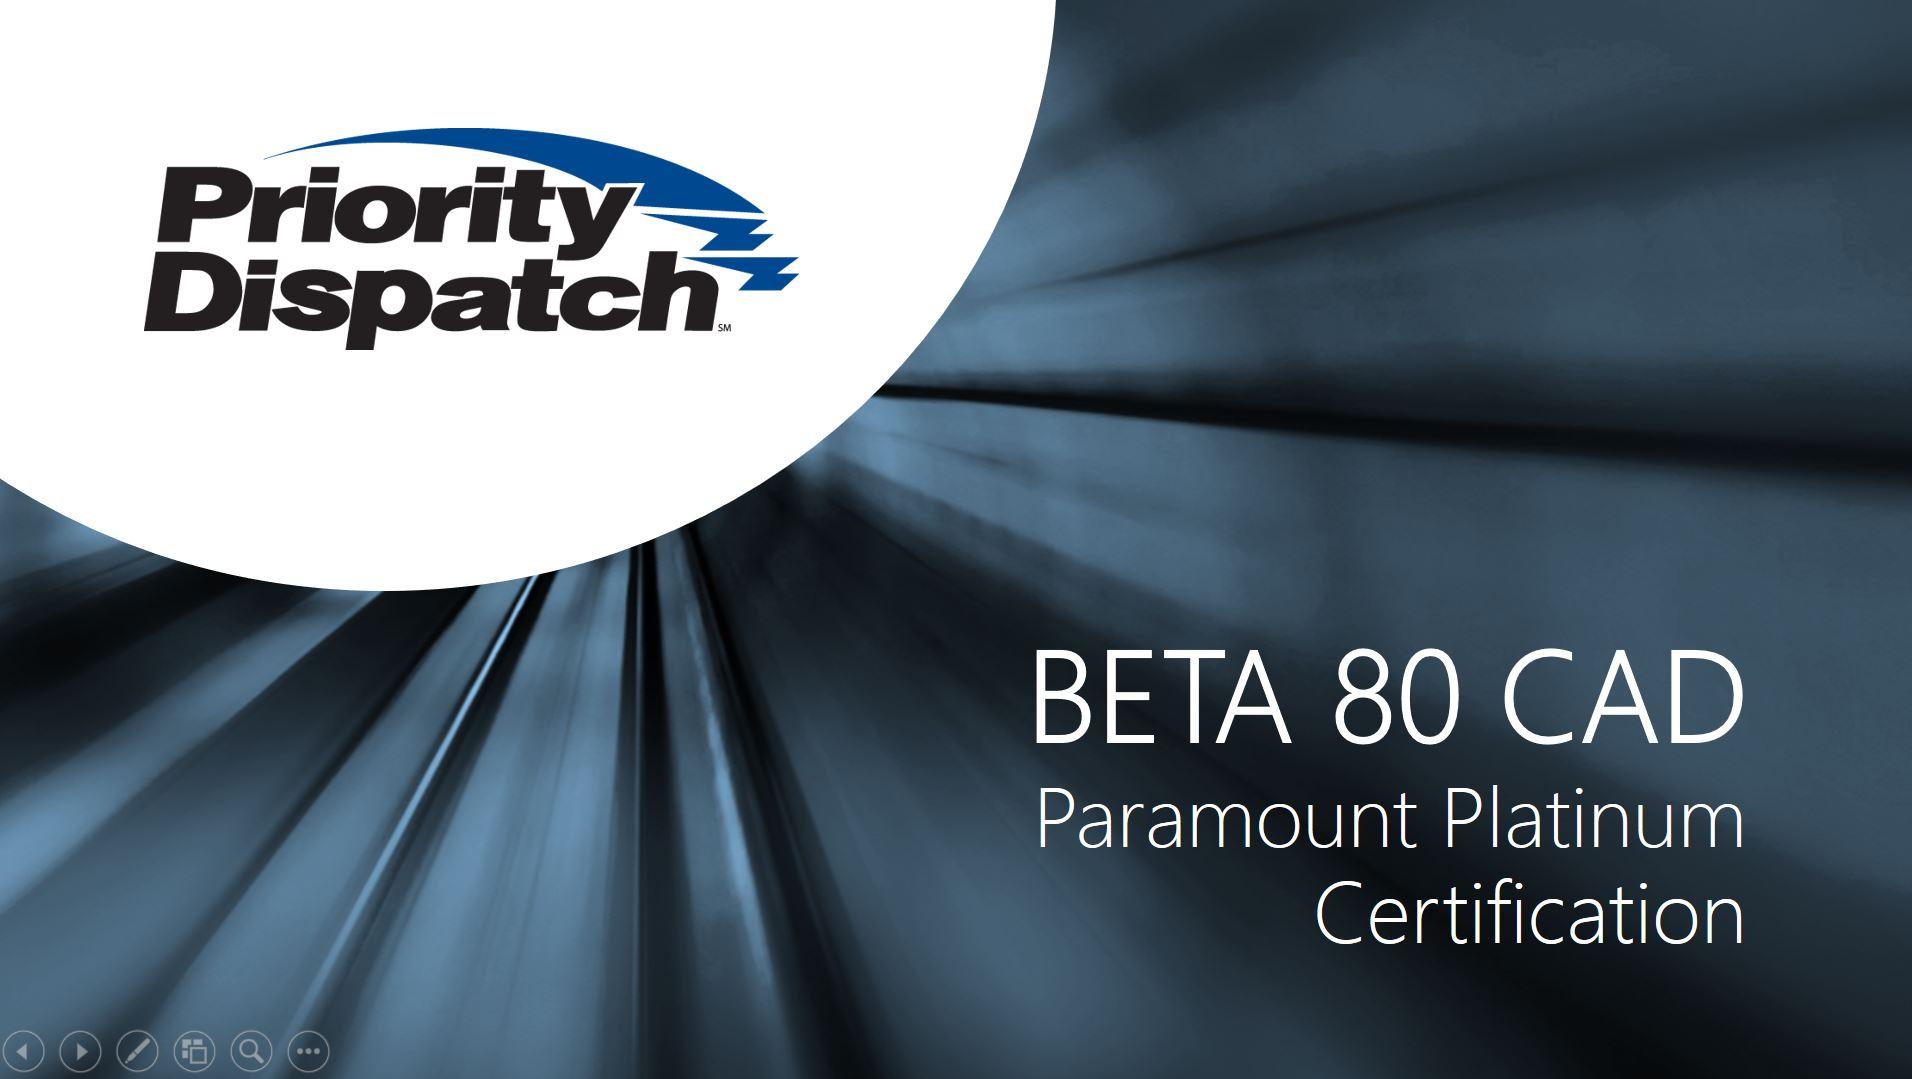 Beta 80 Cad Awarded Paramount Platinum Certification Us